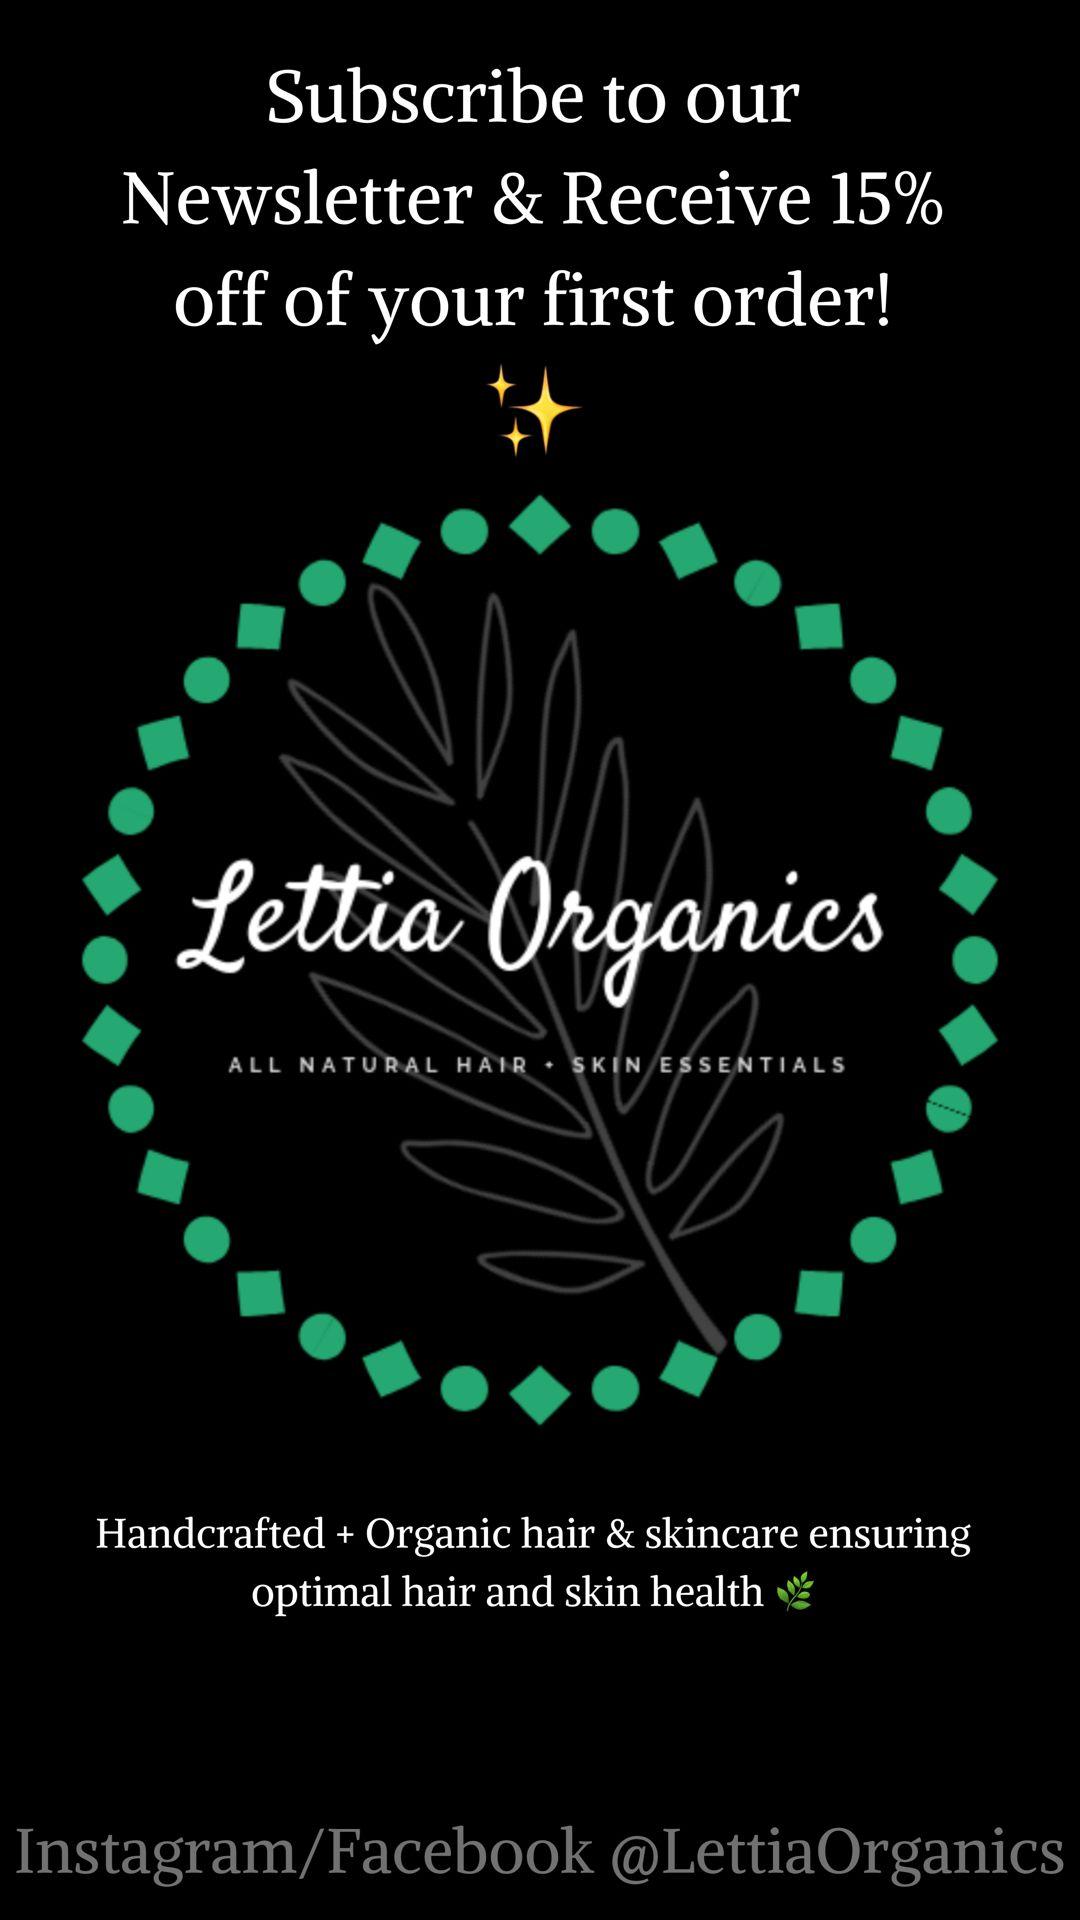 LETTIA ORGANICS • Organic Hair + Skin Care Essentials